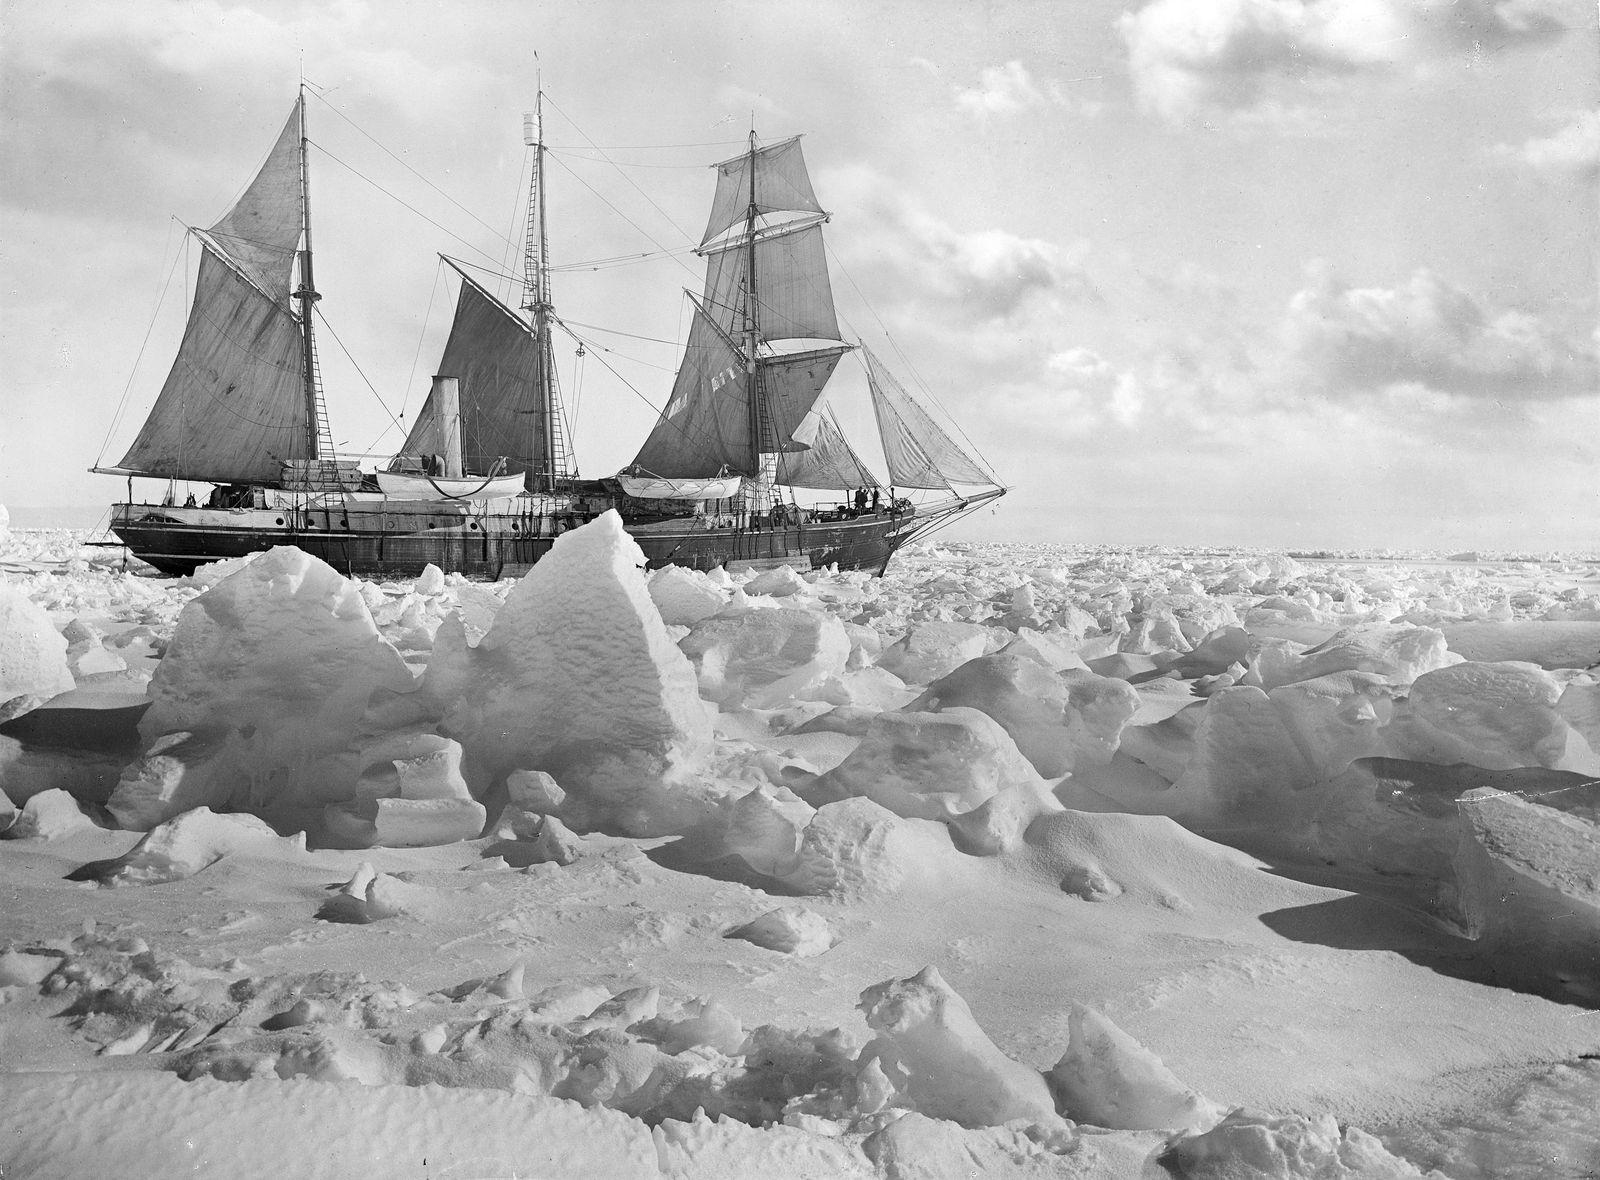 endurance full sail Hurley